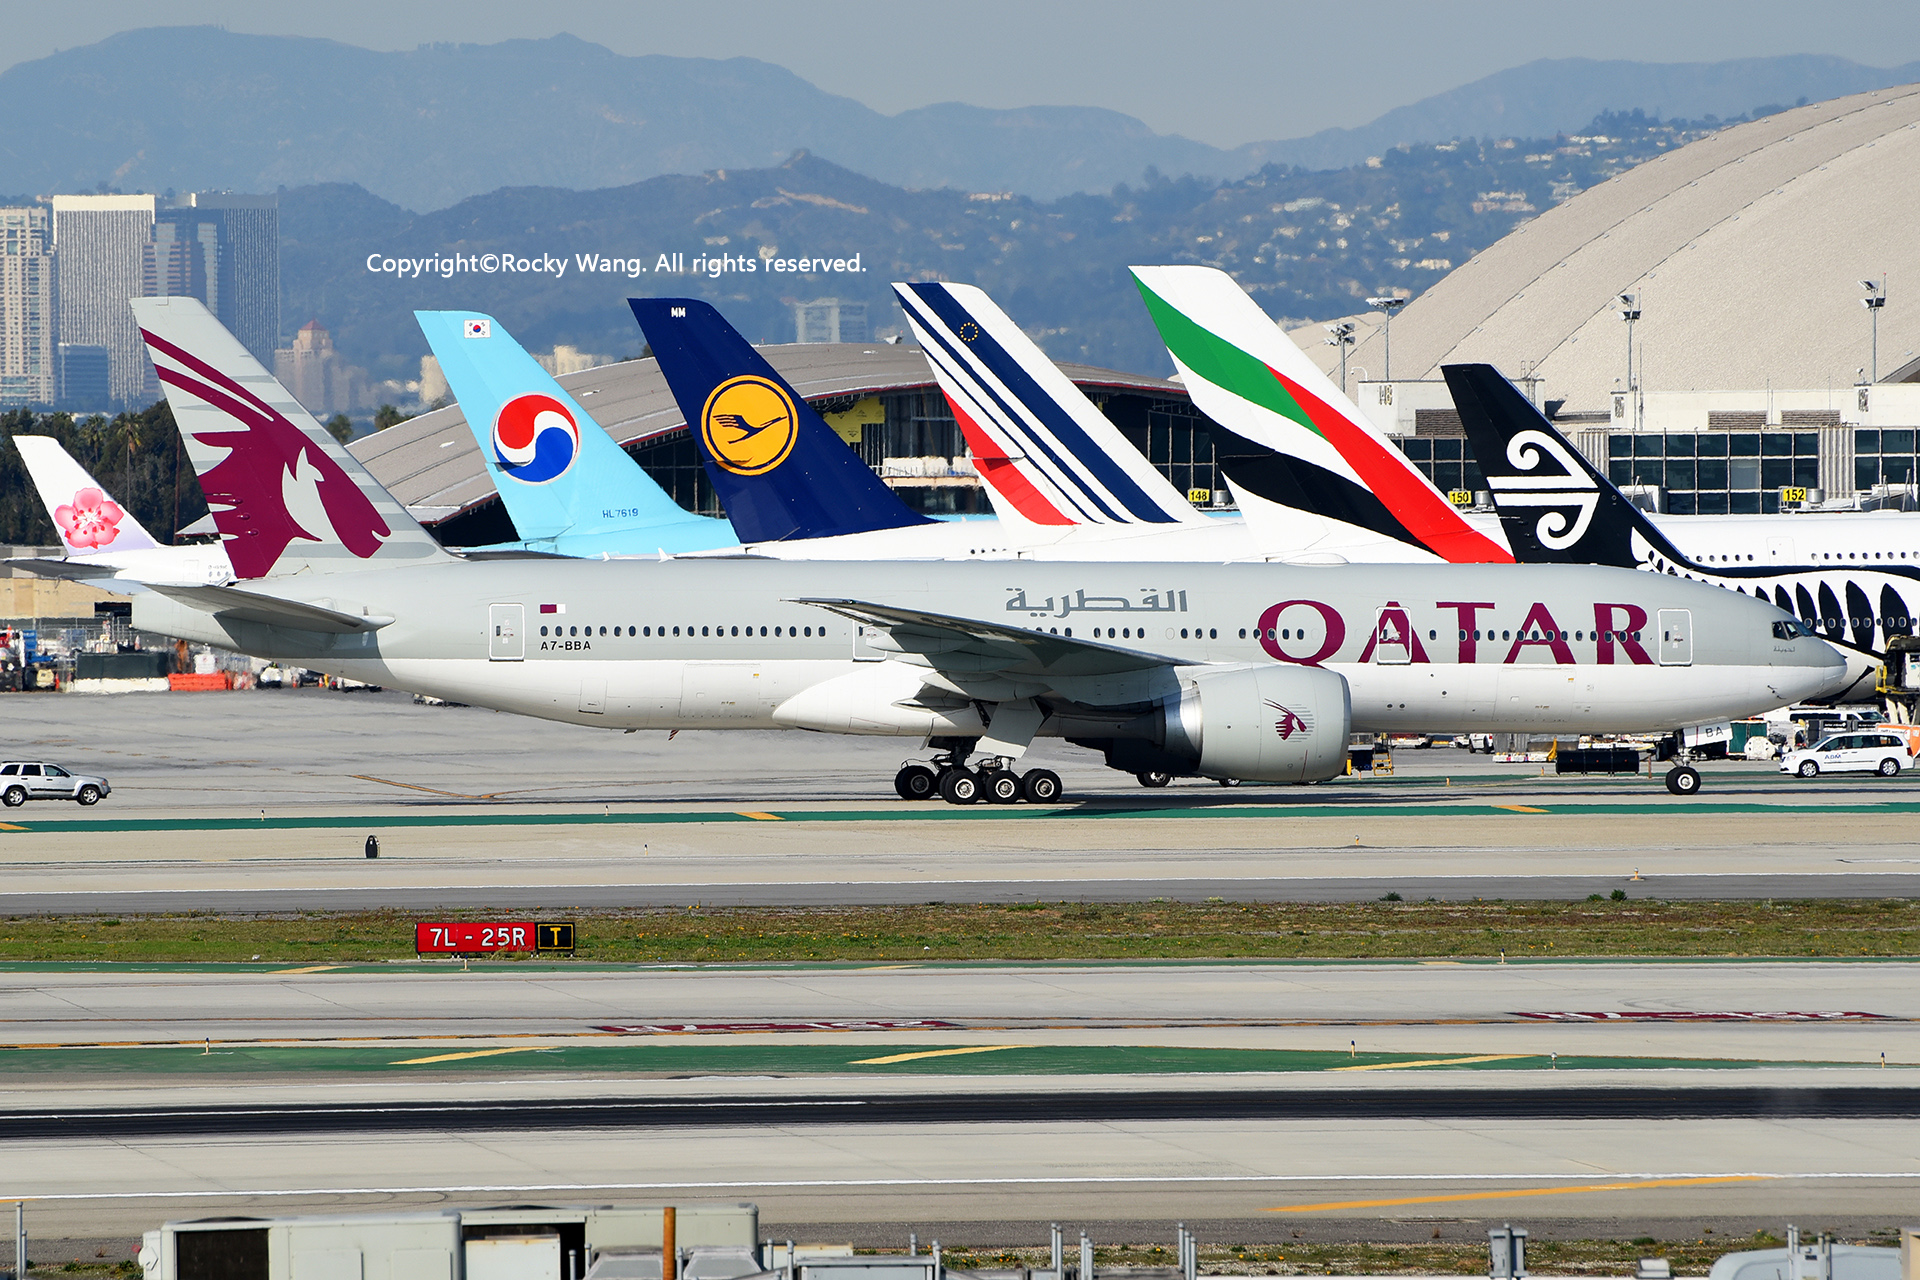 Re:[原创]居家了 批量处理老图 倾情奉献52家777 BOEING 777-2DZLR A7-BBA Los Angeles Int'l Airport